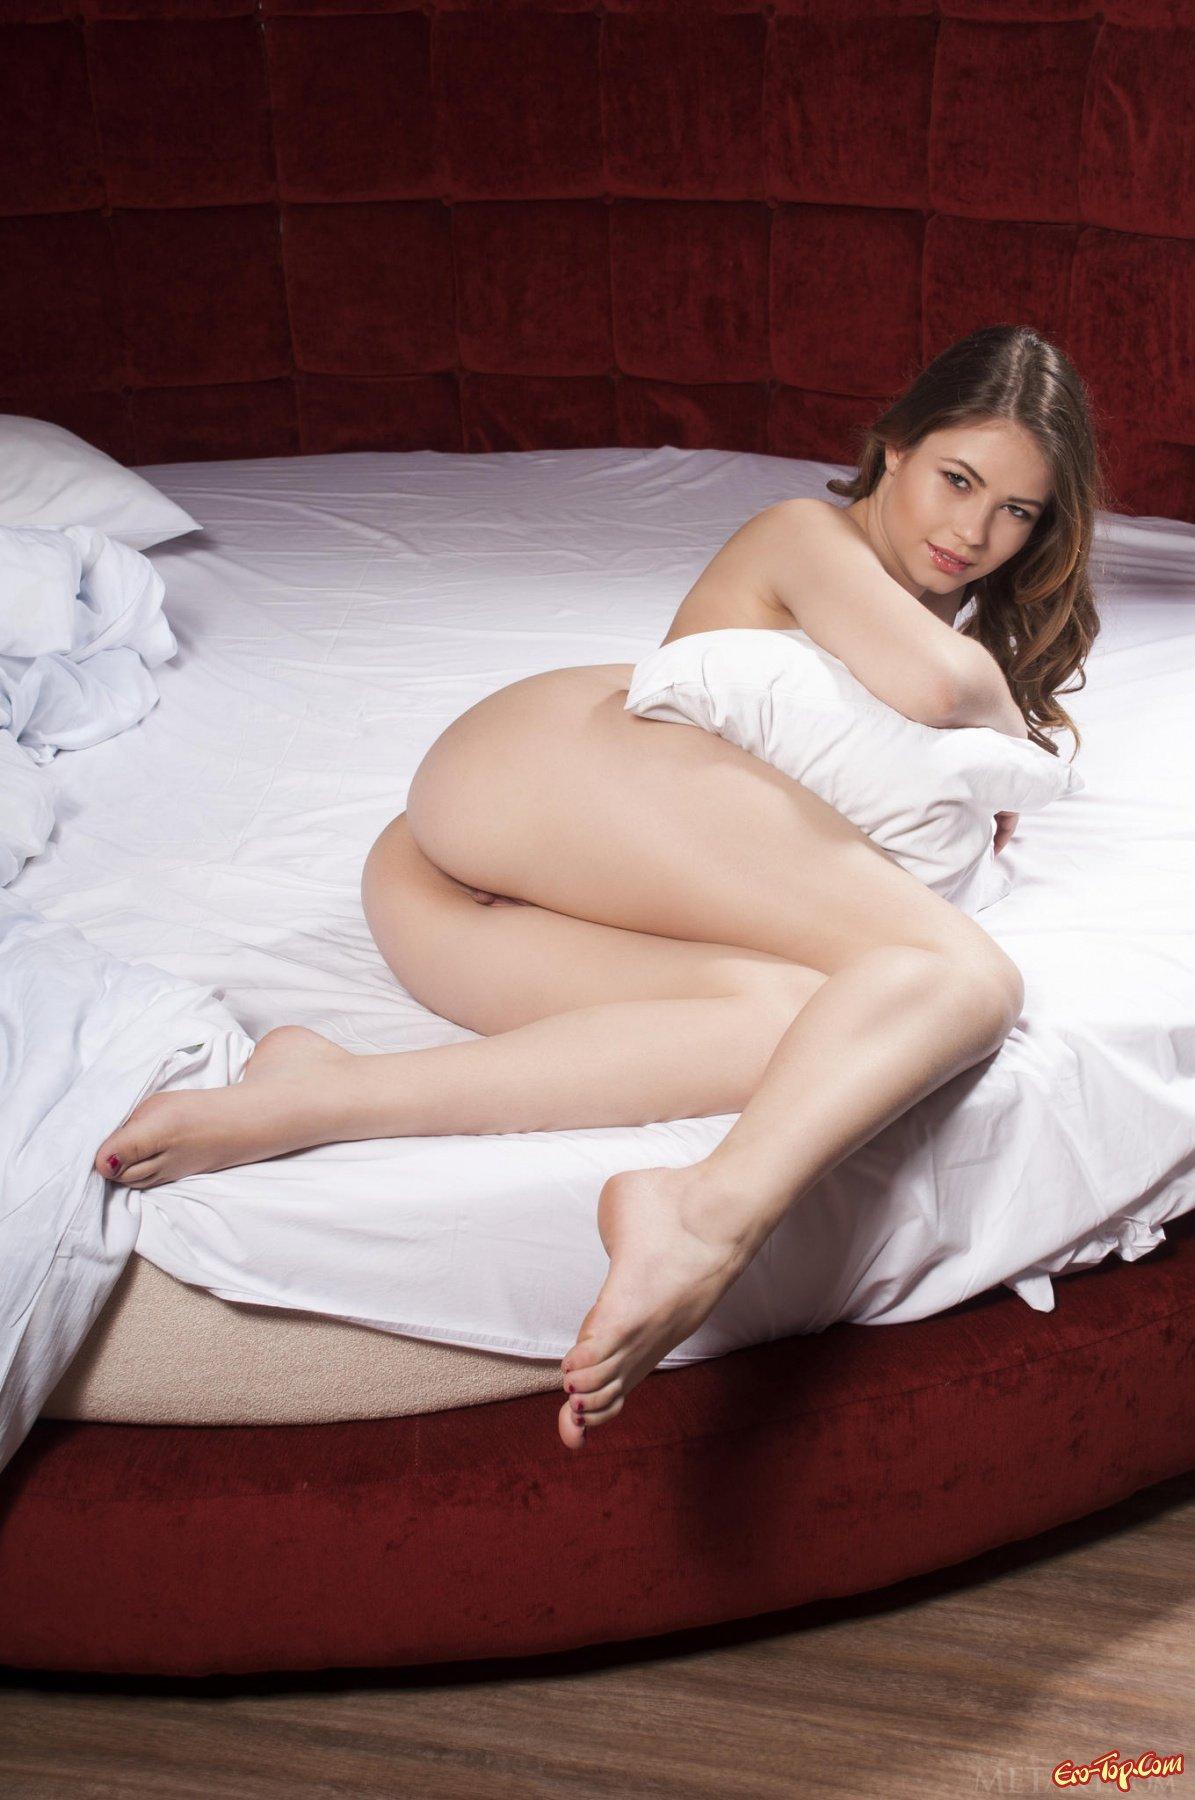 Фото голая девушка в постеле фото 130-772